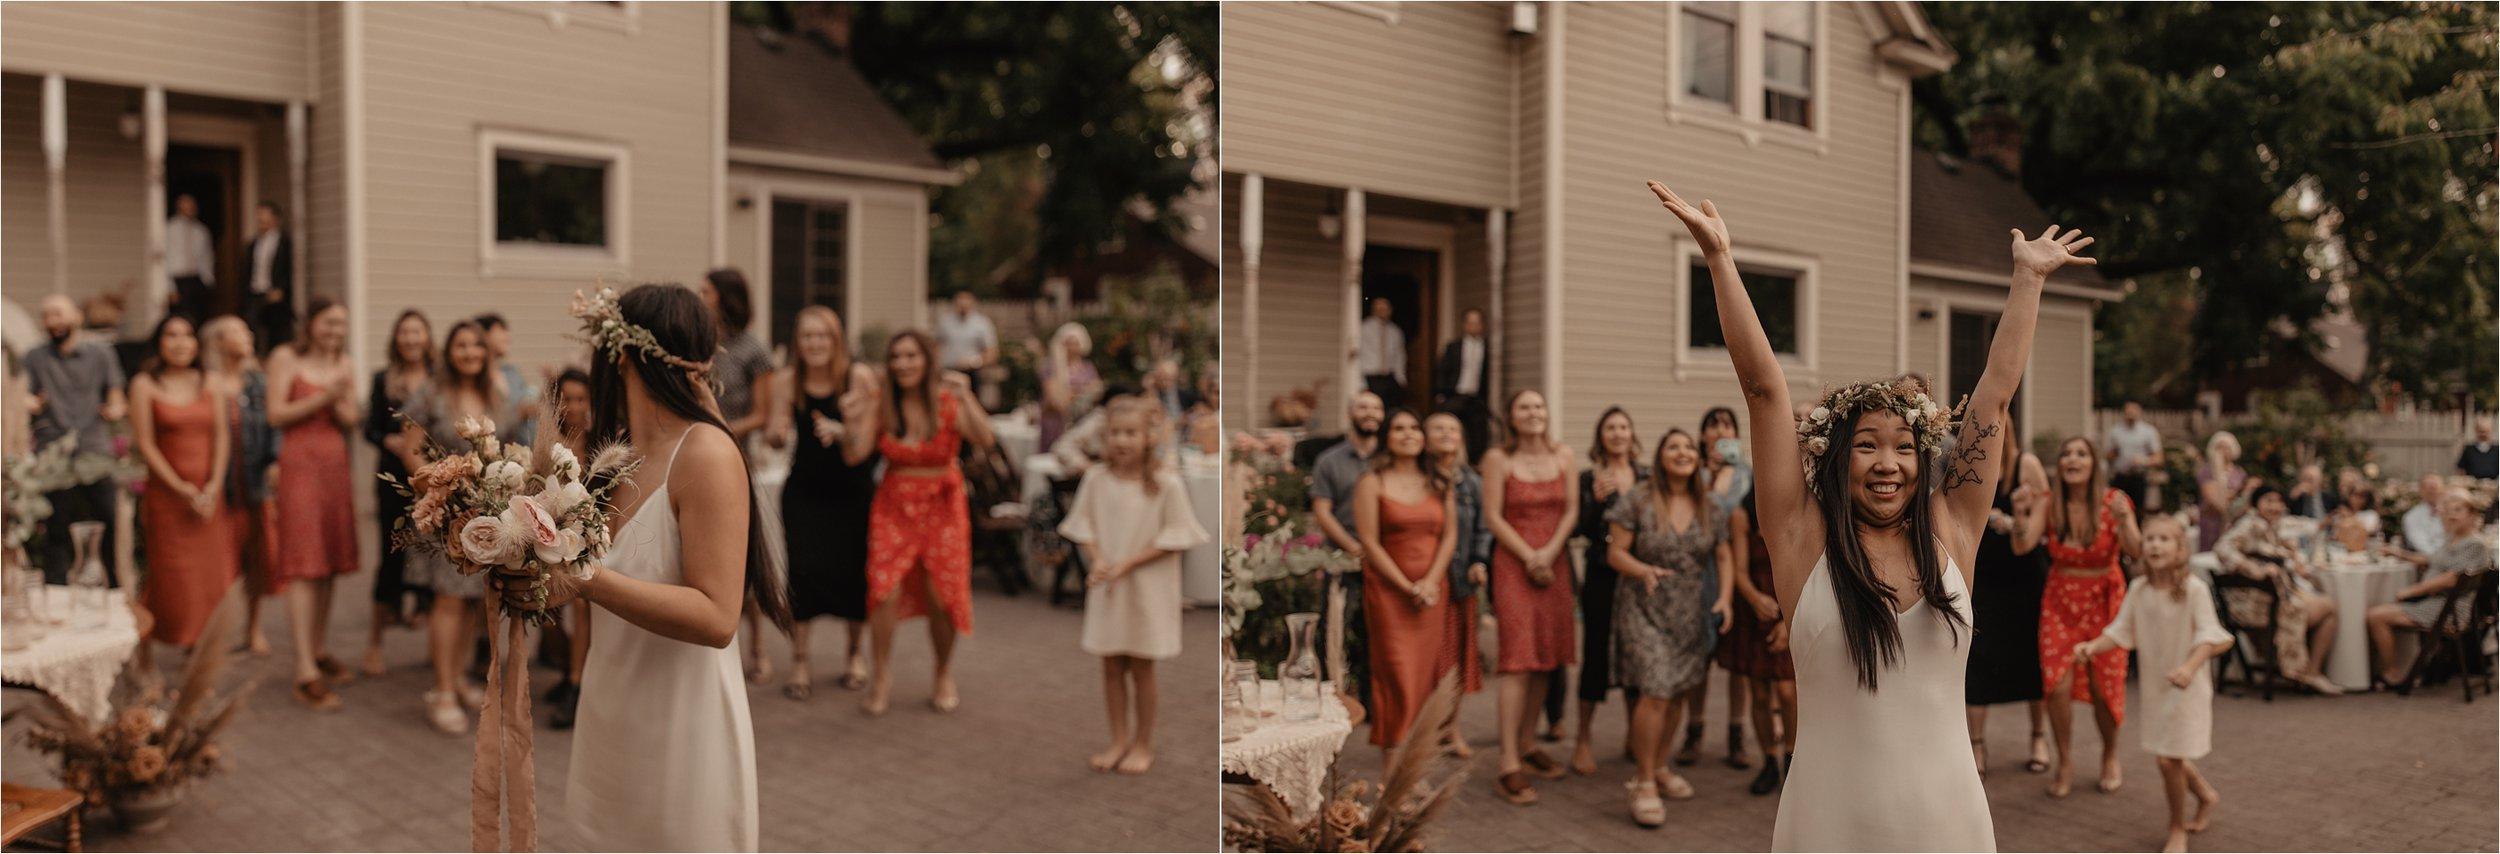 intimate-portland-modern-trendy-wedding_0102.jpg